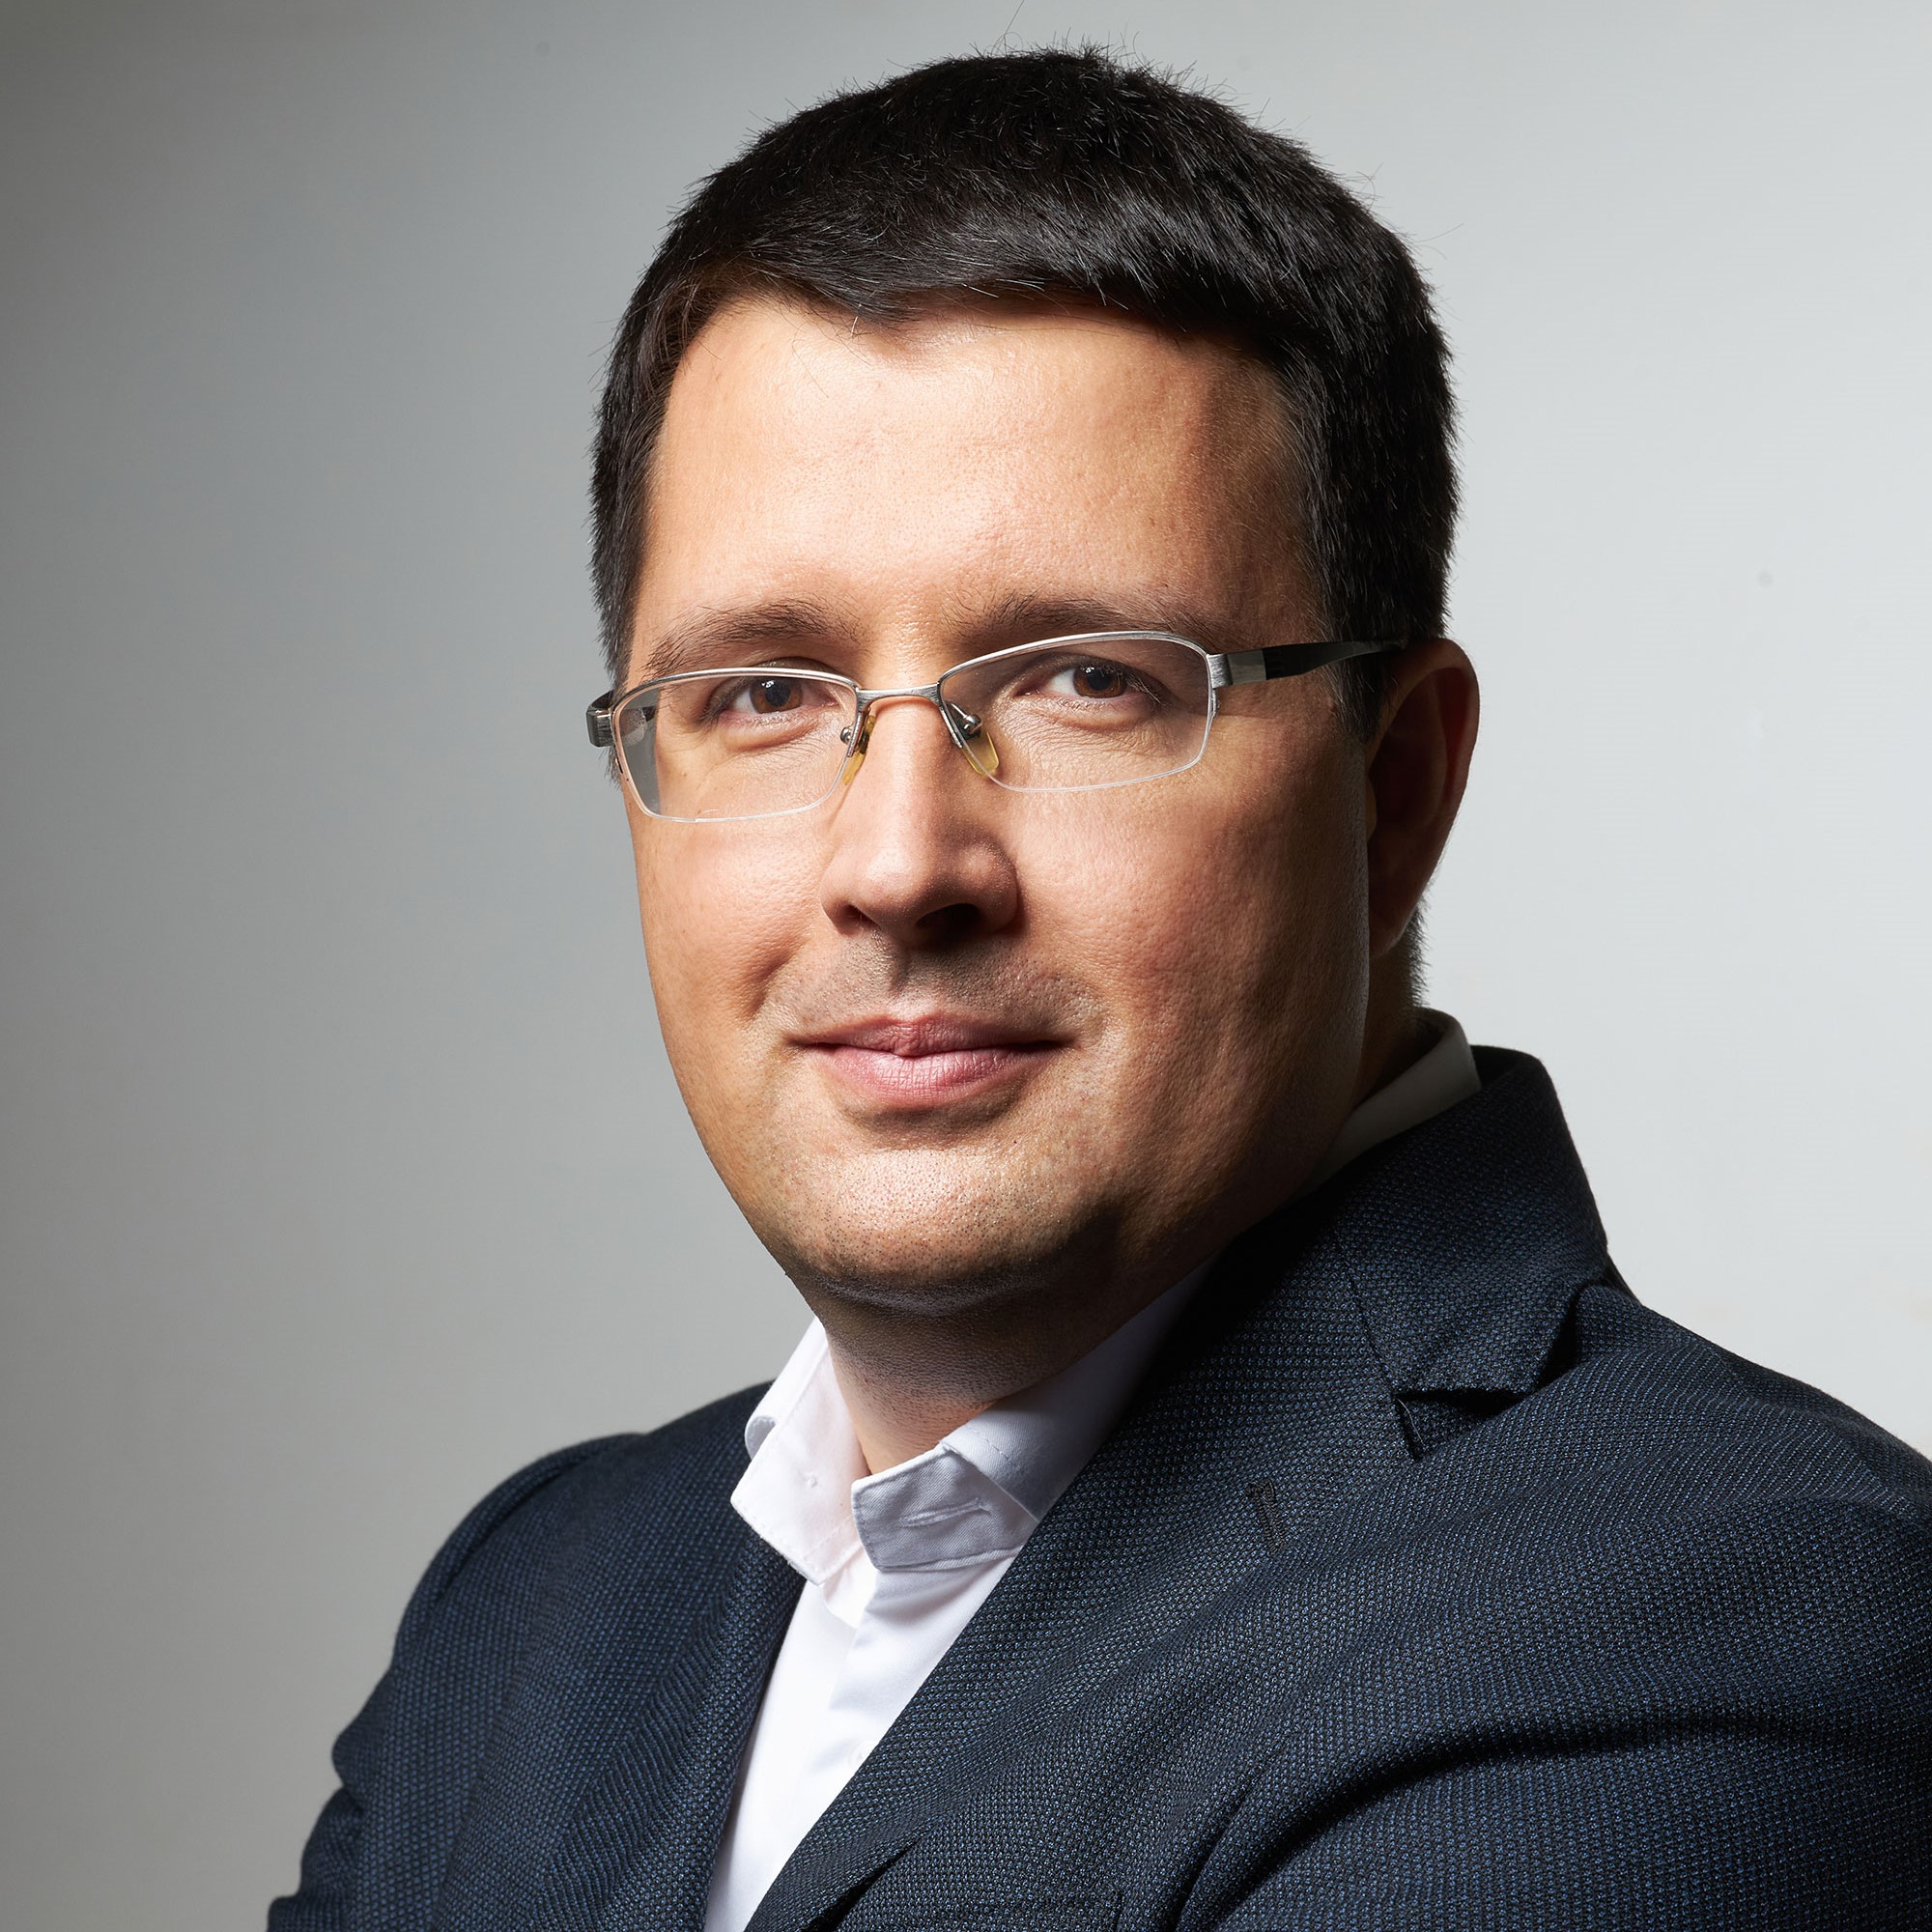 Aleksandar Bijelic